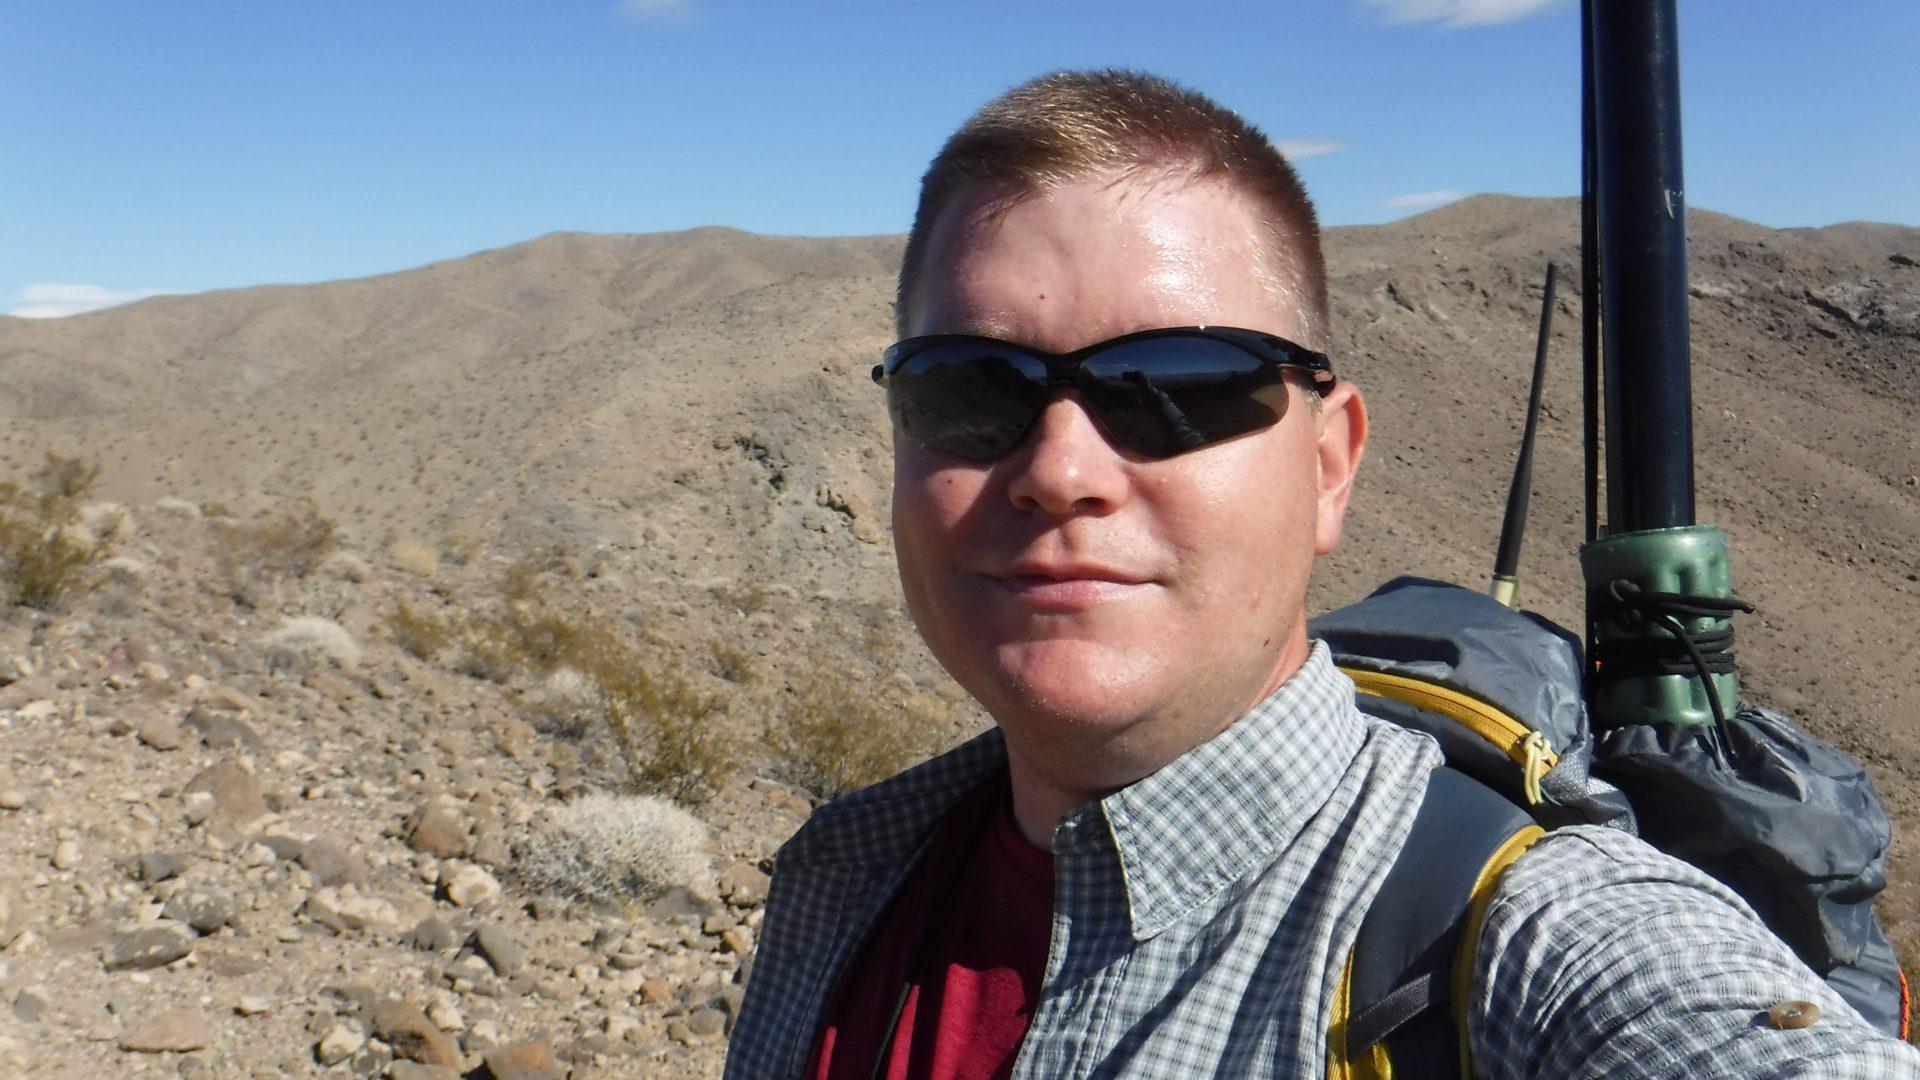 SOTA amateur radio operator in the desert